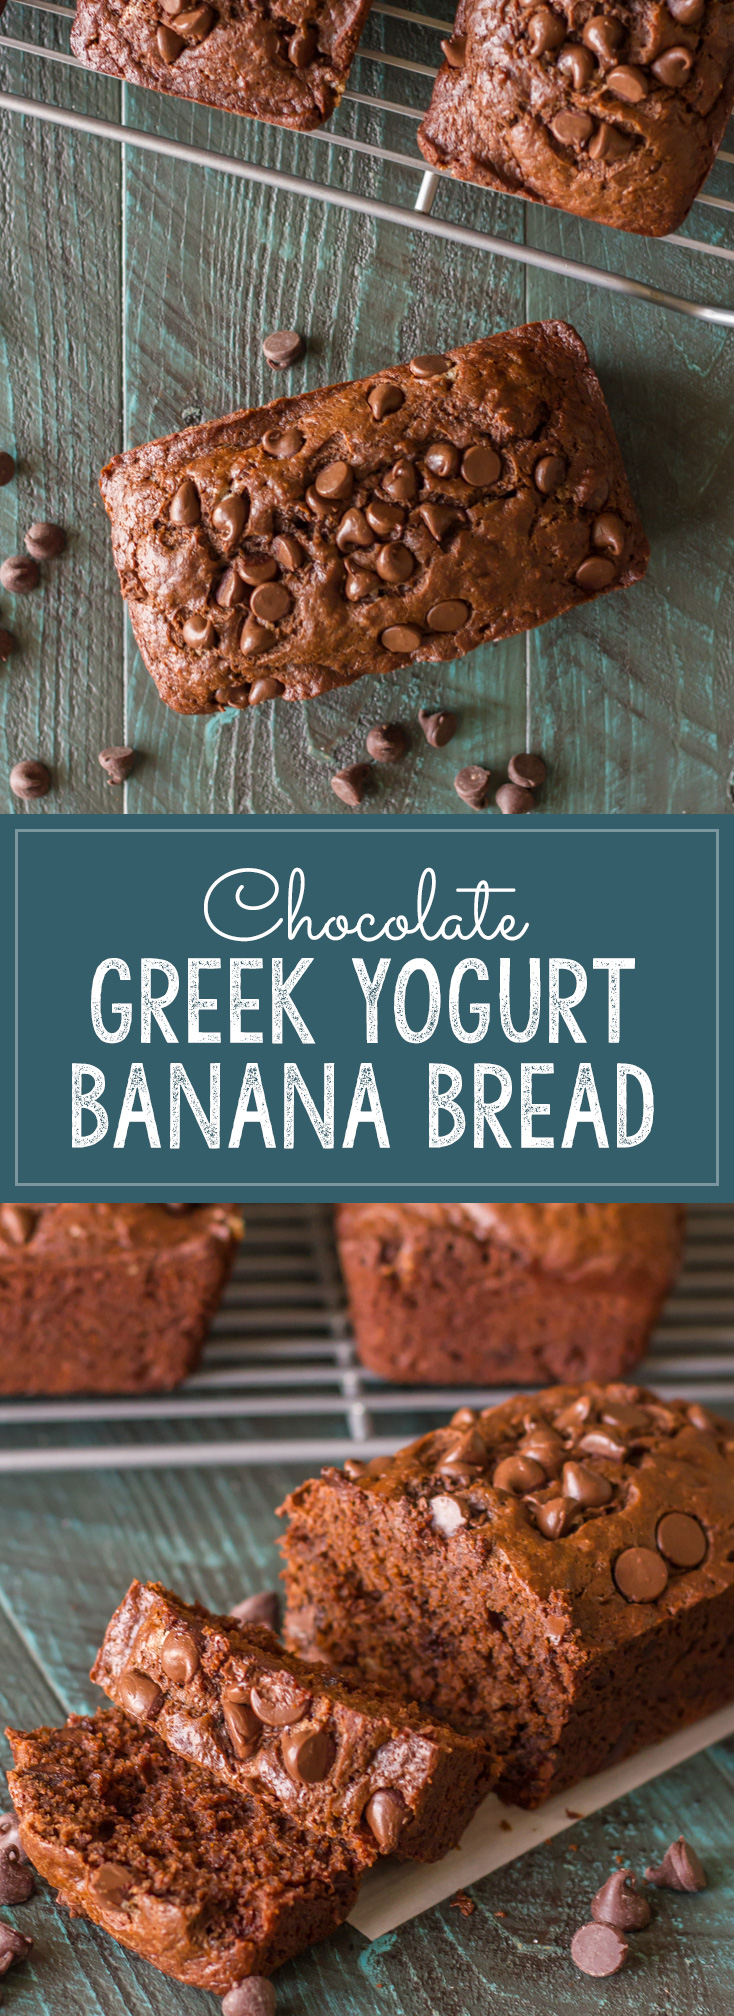 Chocolate Chocolate Chip Greek Yogurt Banana Bread - So amazing what a ...